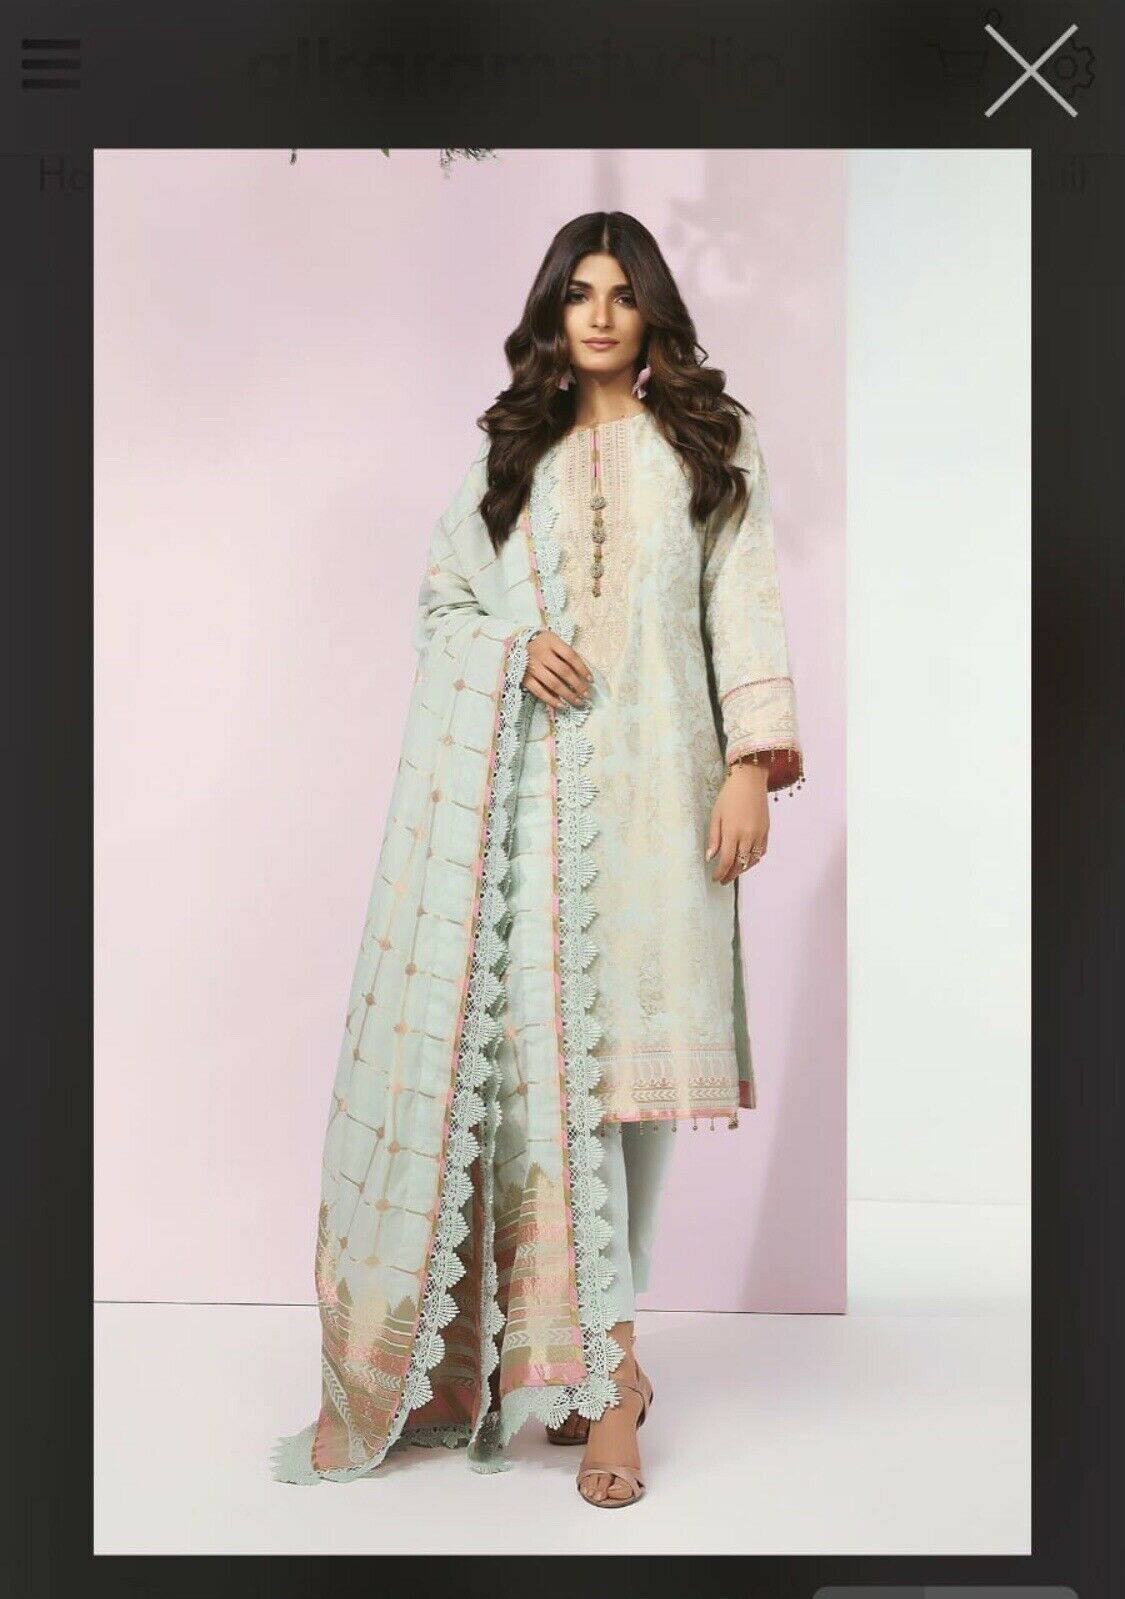 Pakistani Designer Suit By Al Karam - Stitched - Small Size